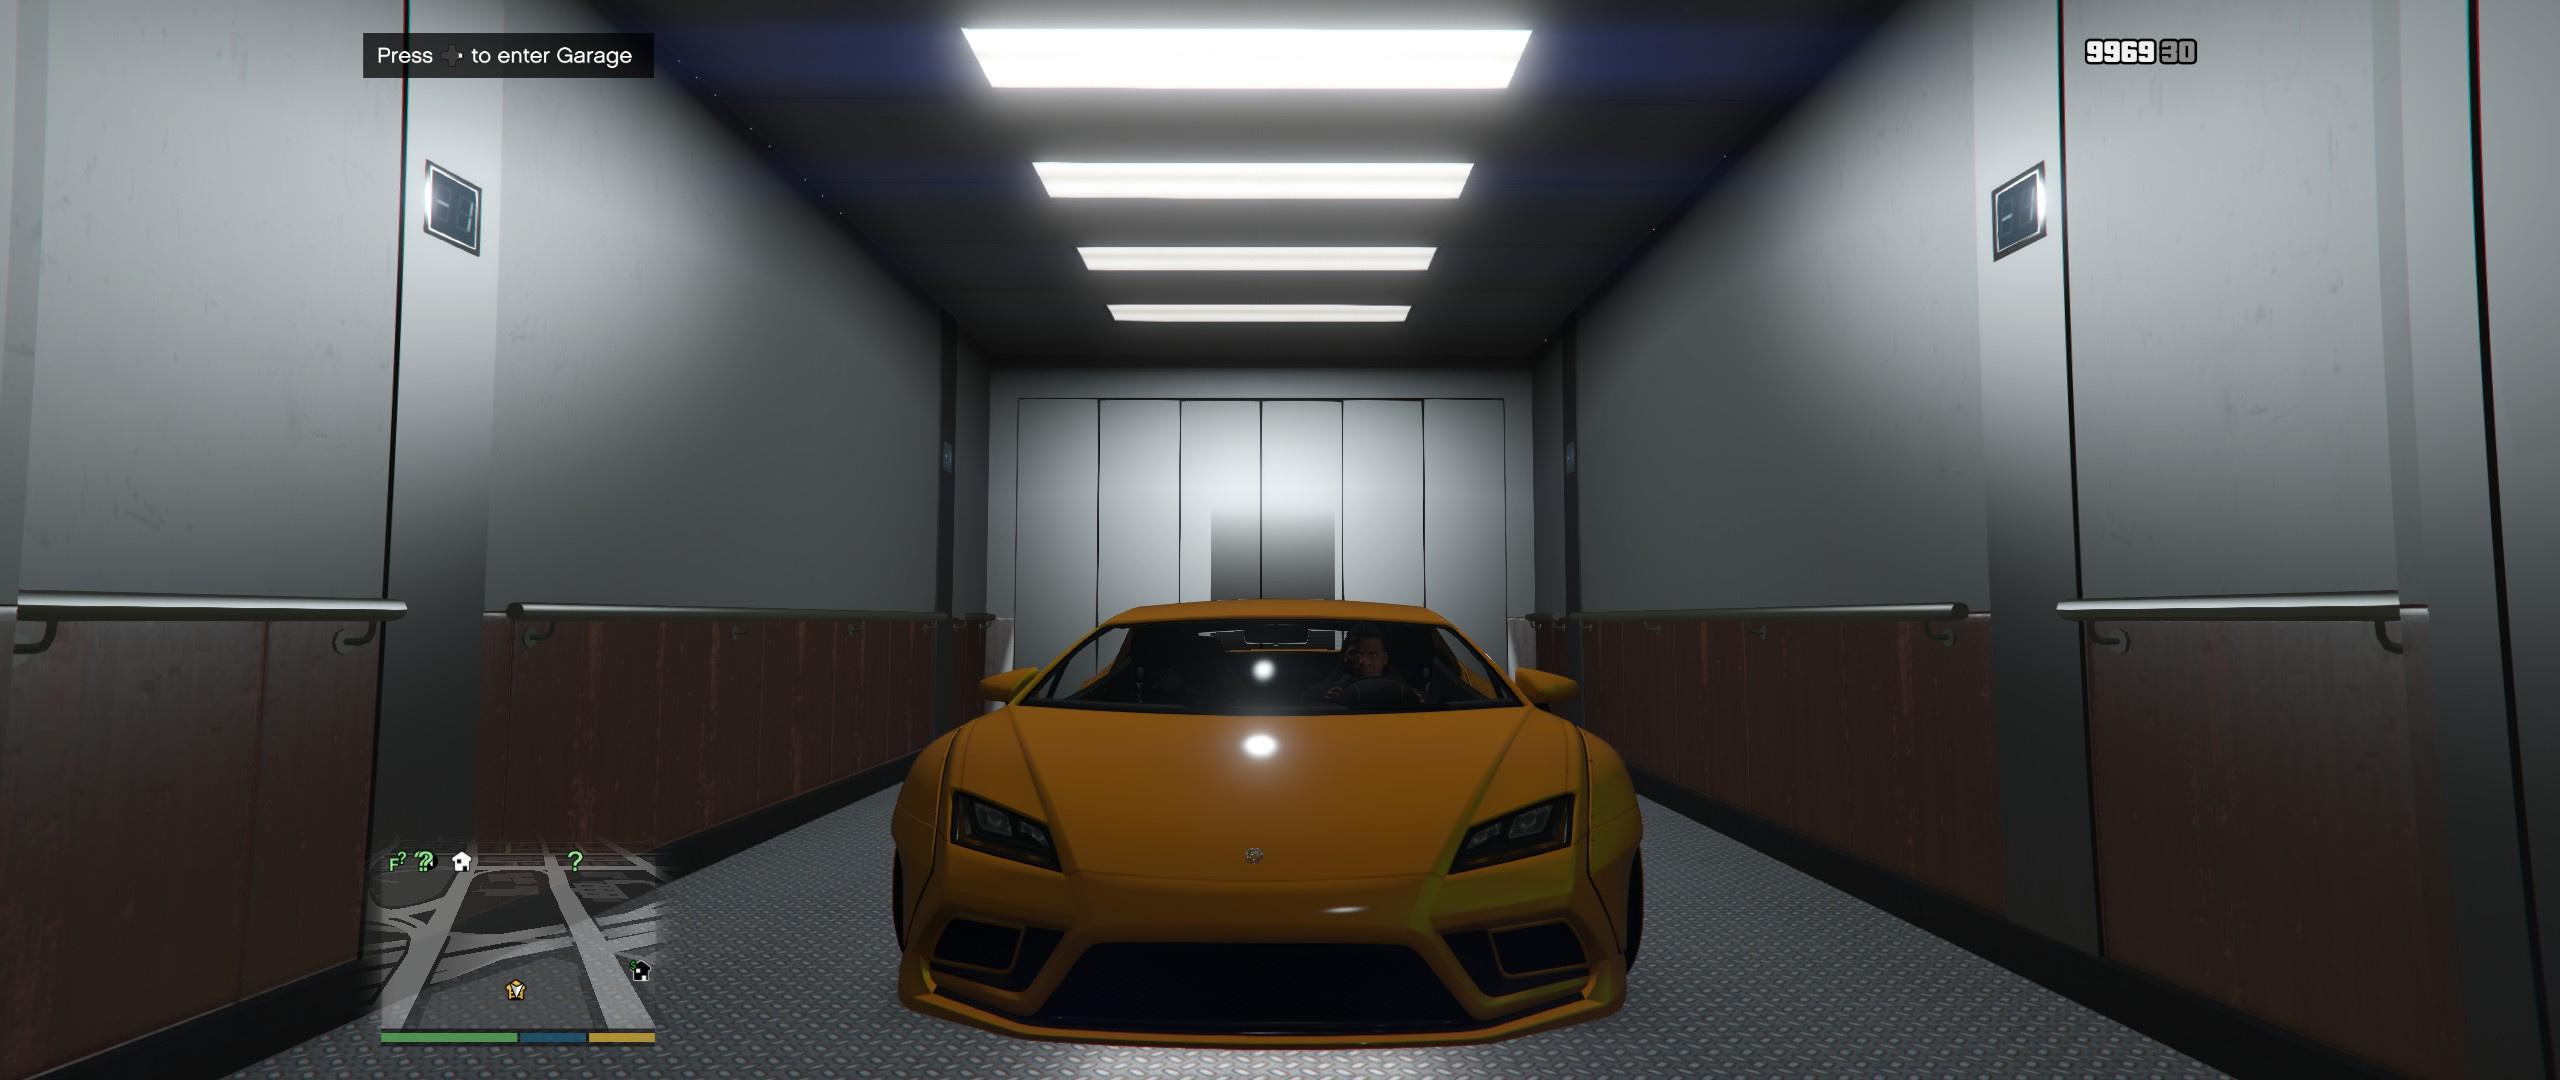 Office Garages Spg Gta5 Modscom